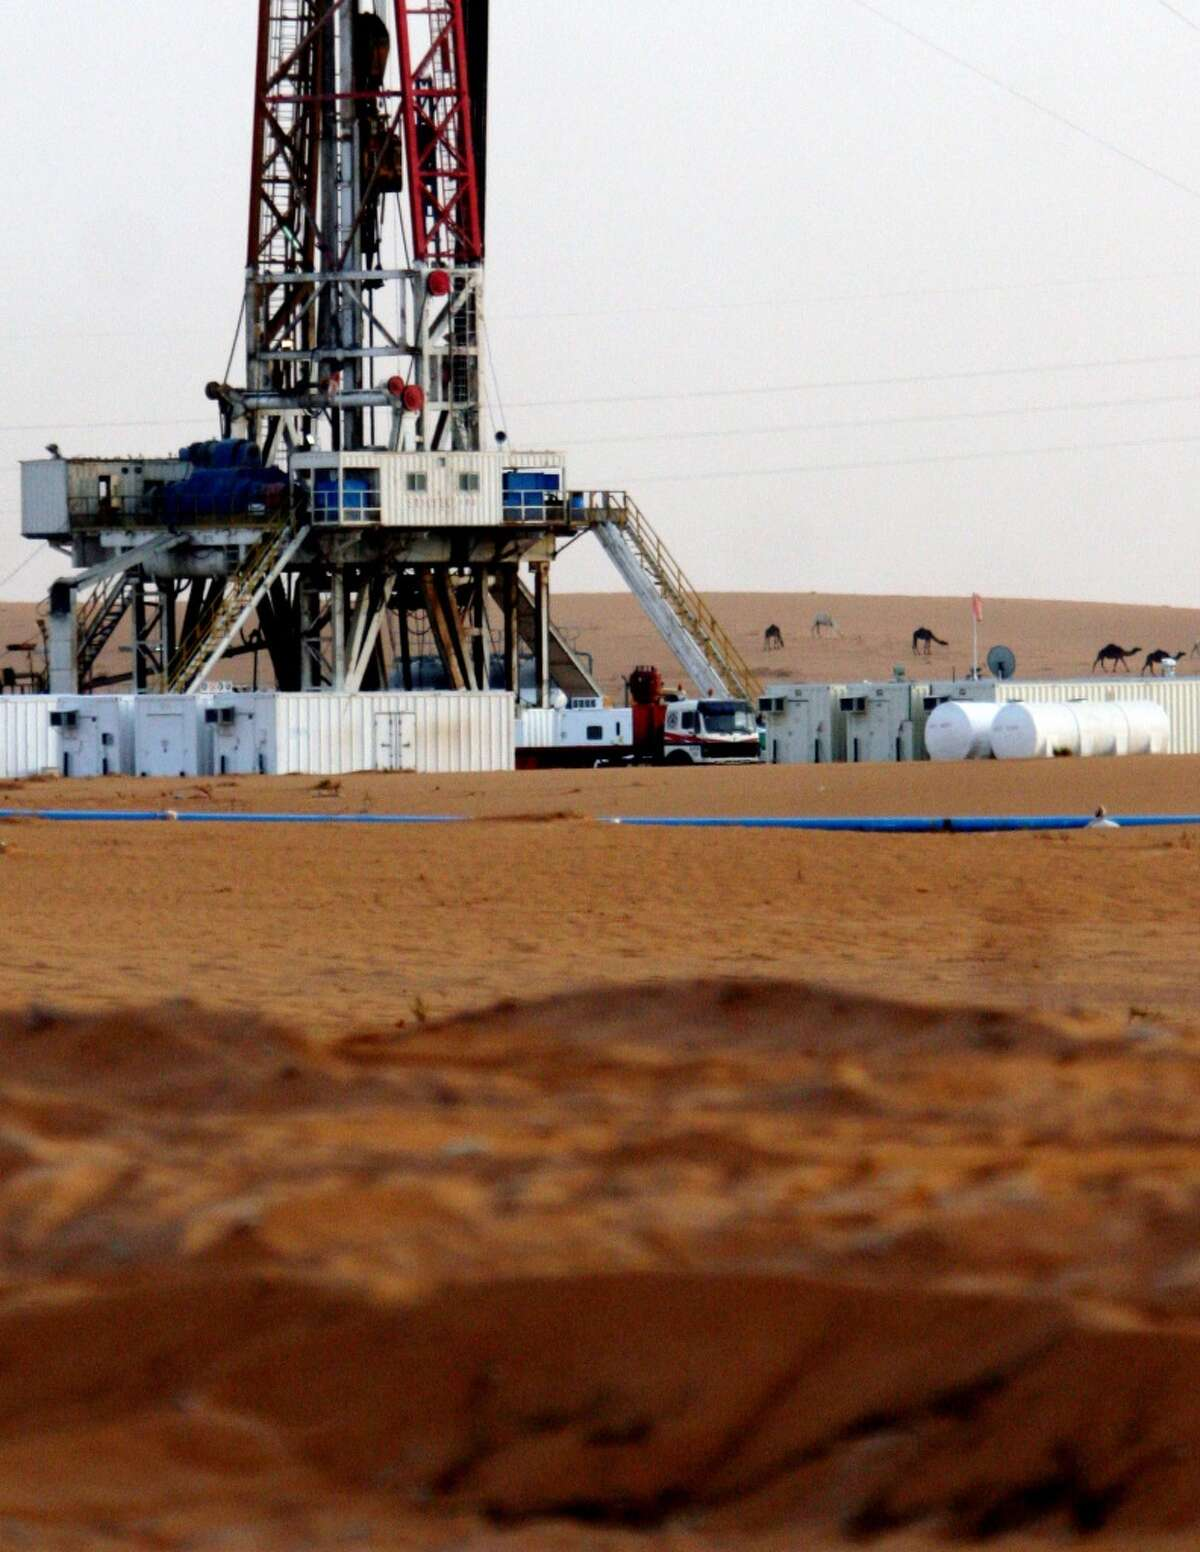 1. Saudi Arabia Jan. - June 2013: $142 billion 2012: $311 billion [Photo: Camels gather beyond an oil well near the Khurais oil facility, about 60 miles southeast of Riyadh, Saudi Arabia, Monday, June 23, 2008.]